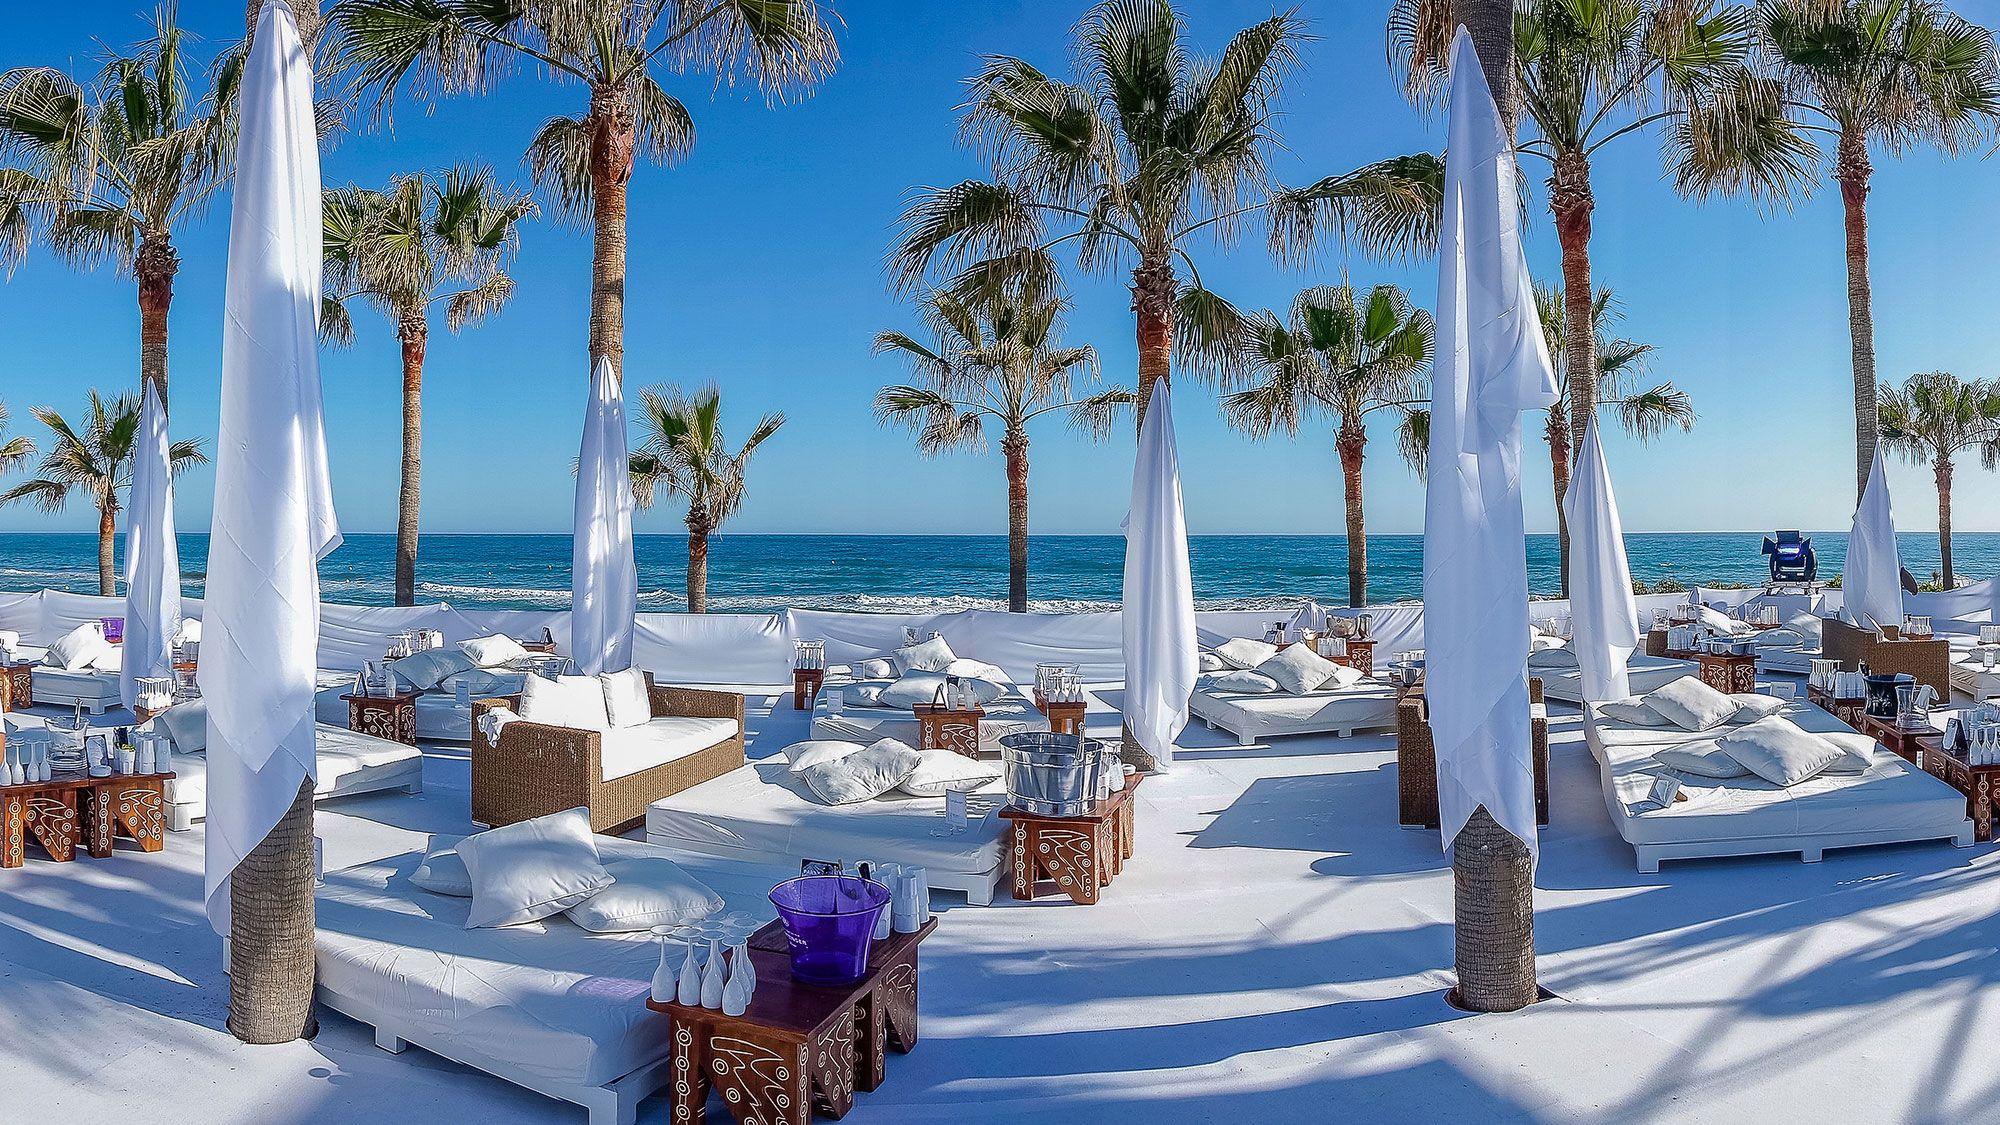 The Best Beaches in The World | Nikki beach marbella